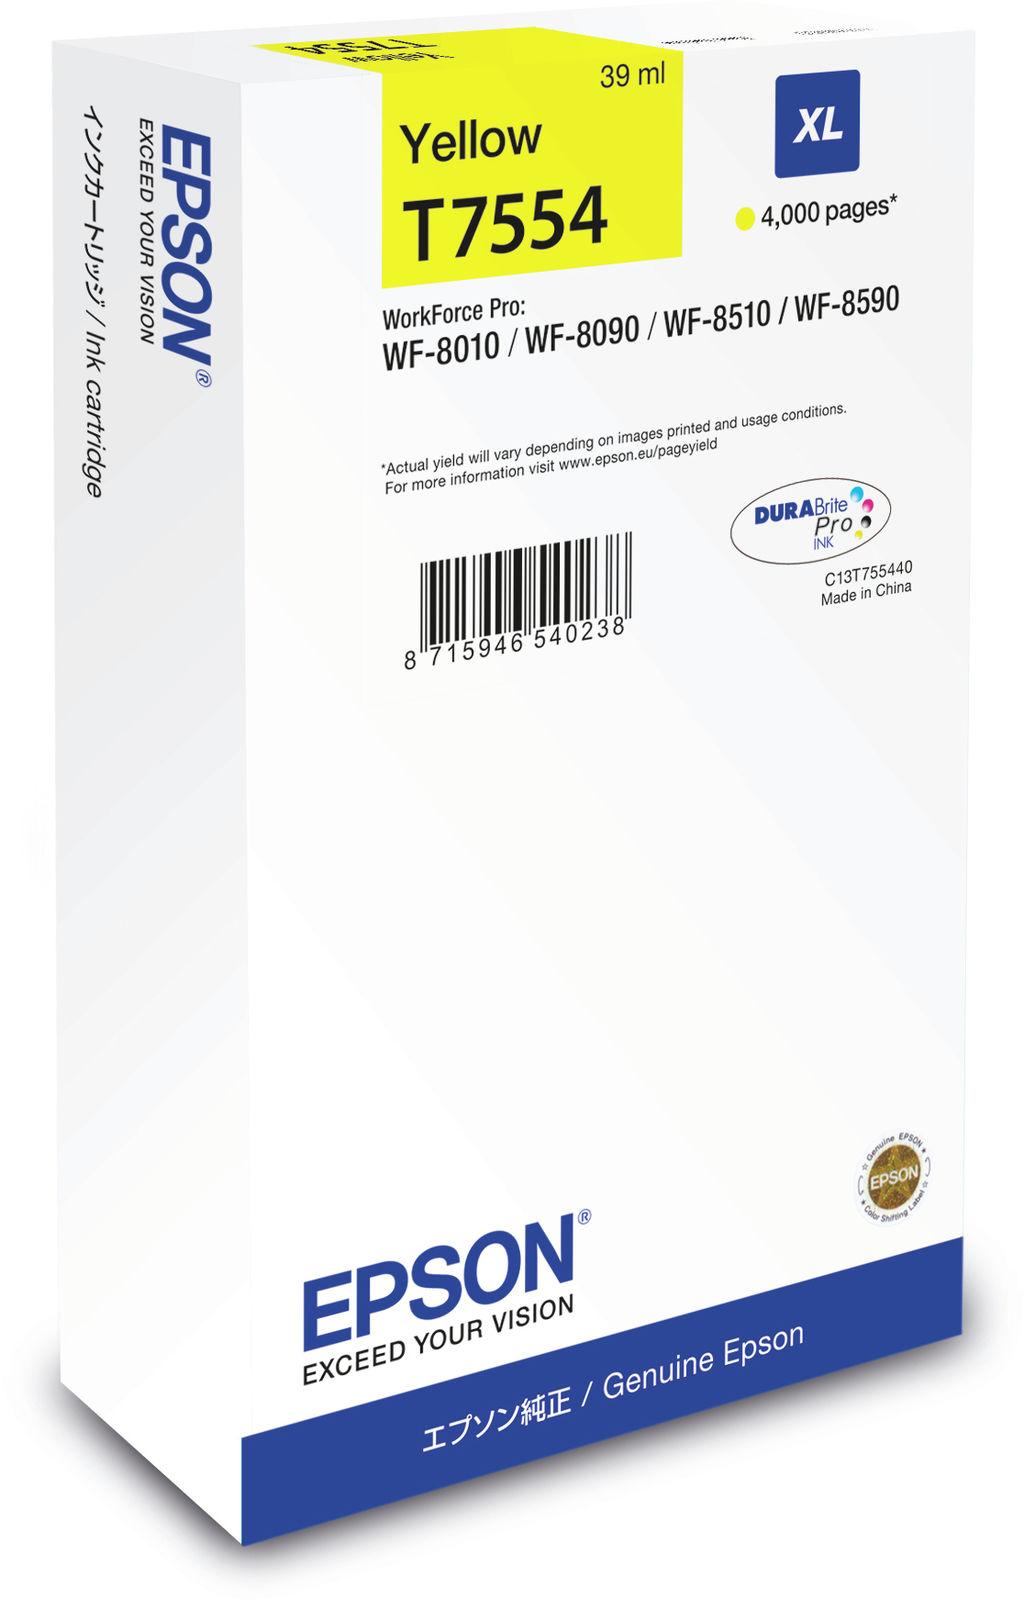 Epson Ink Cartridge XL Yellow